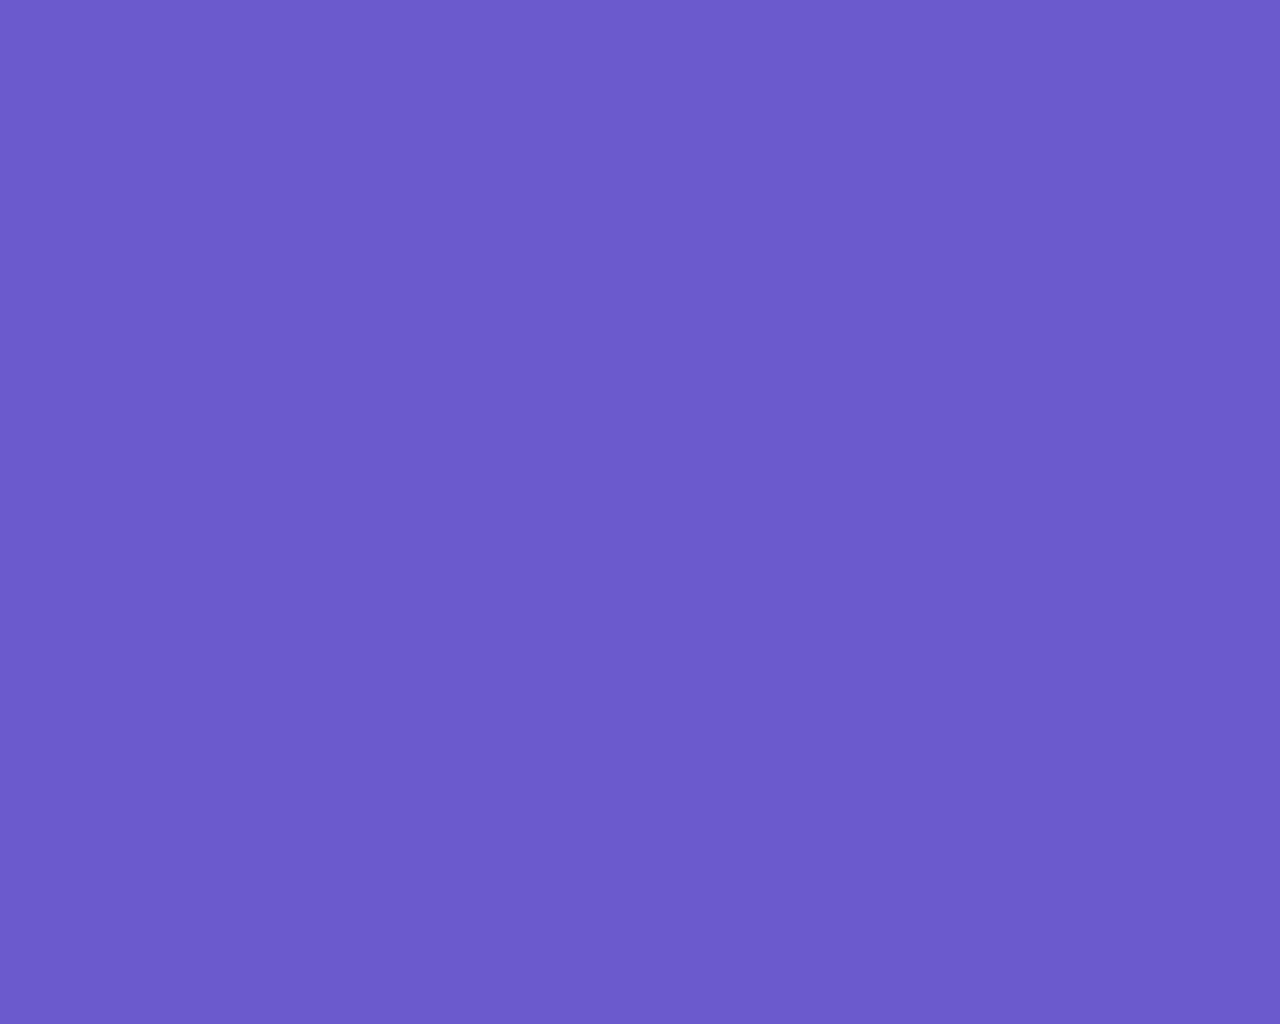 1280x1024 Slate Blue Solid Color Background